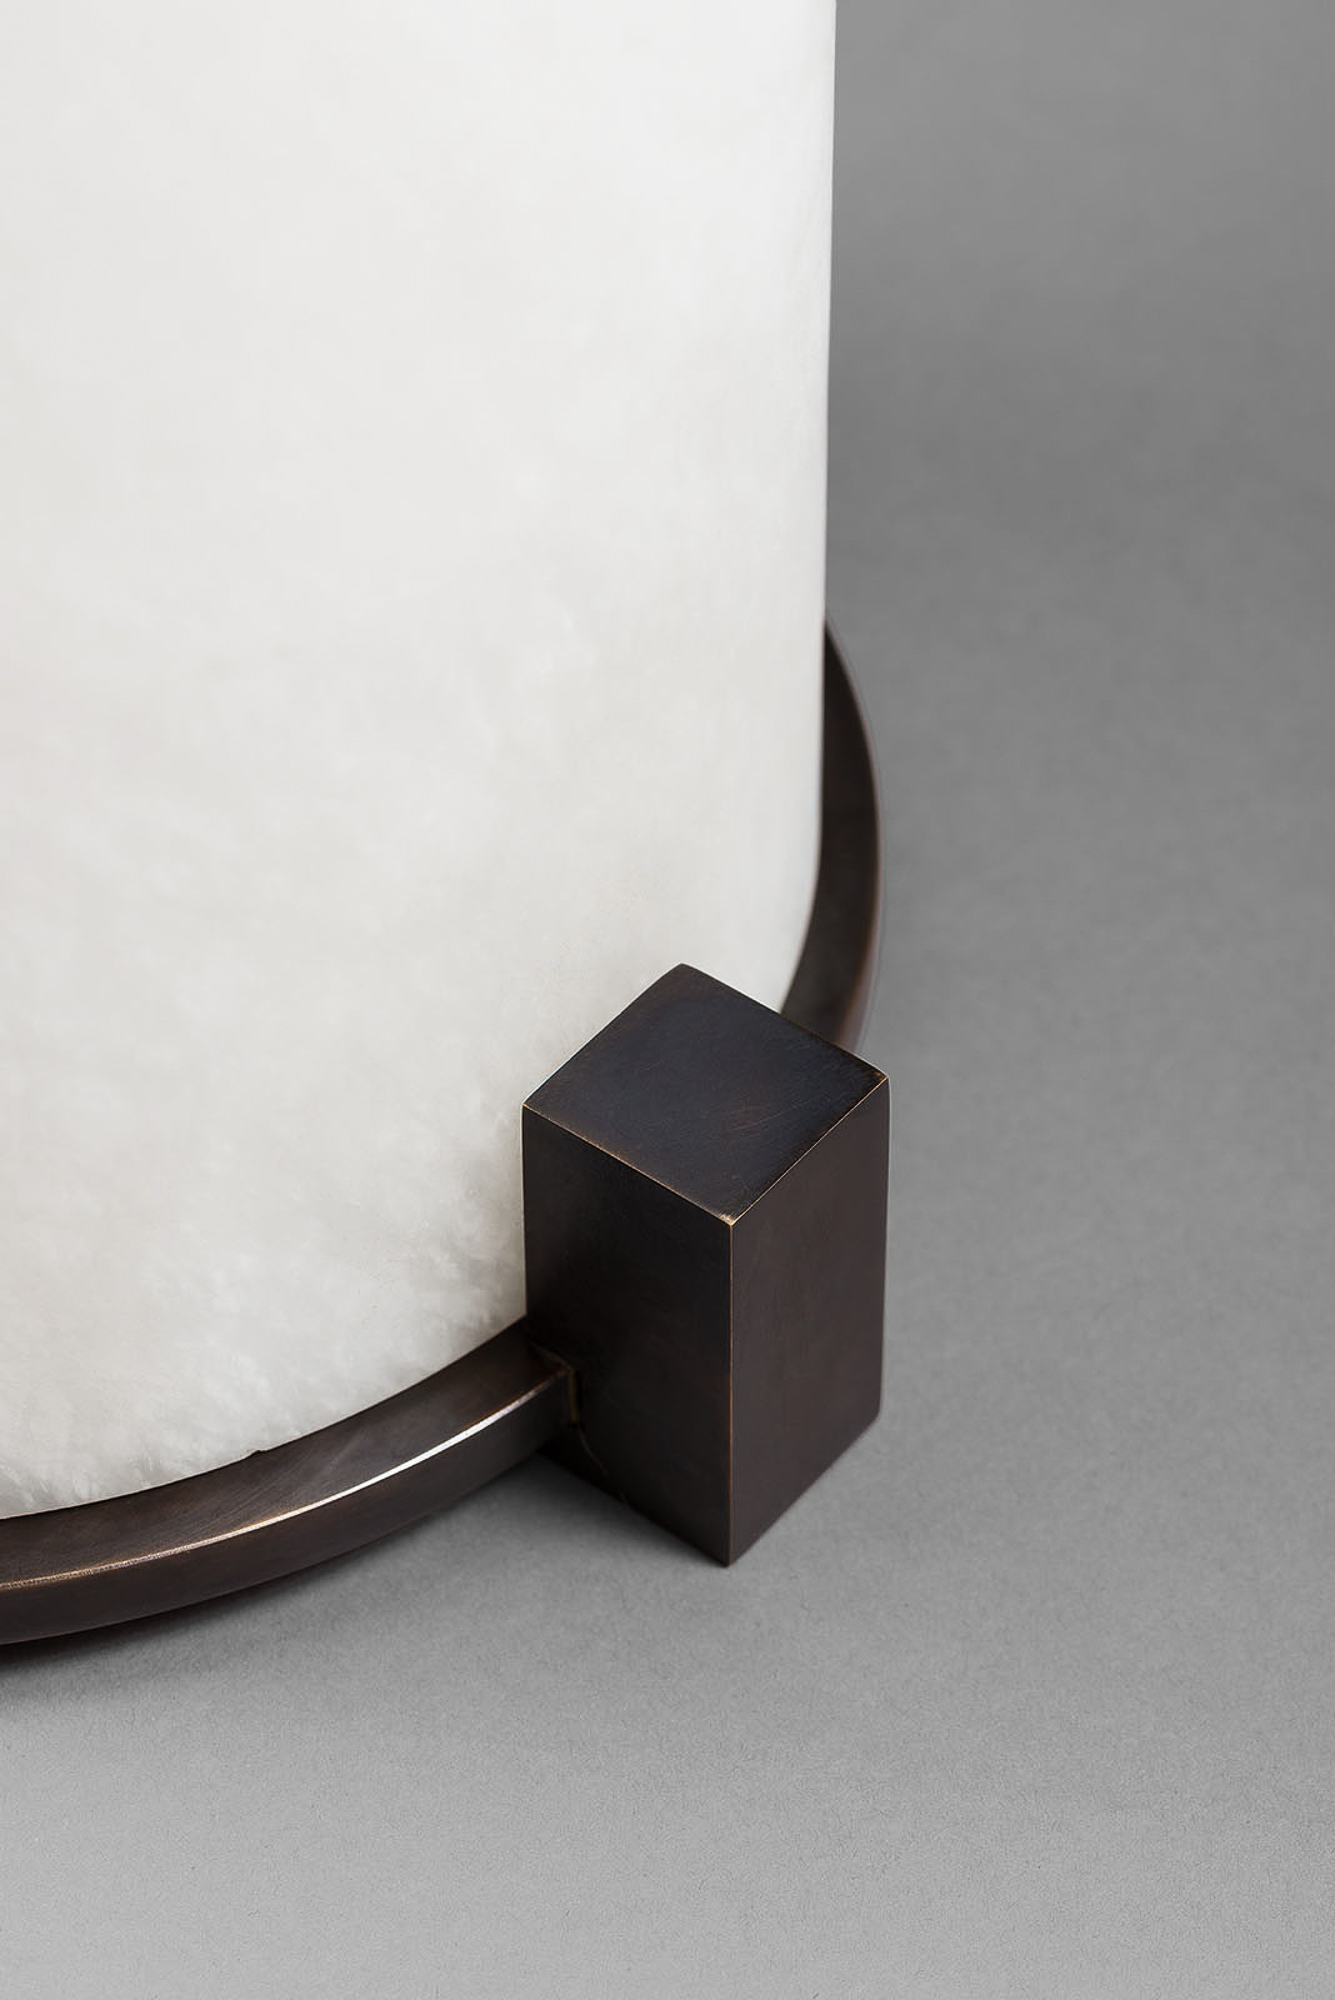 Chahan Minassian / Designer